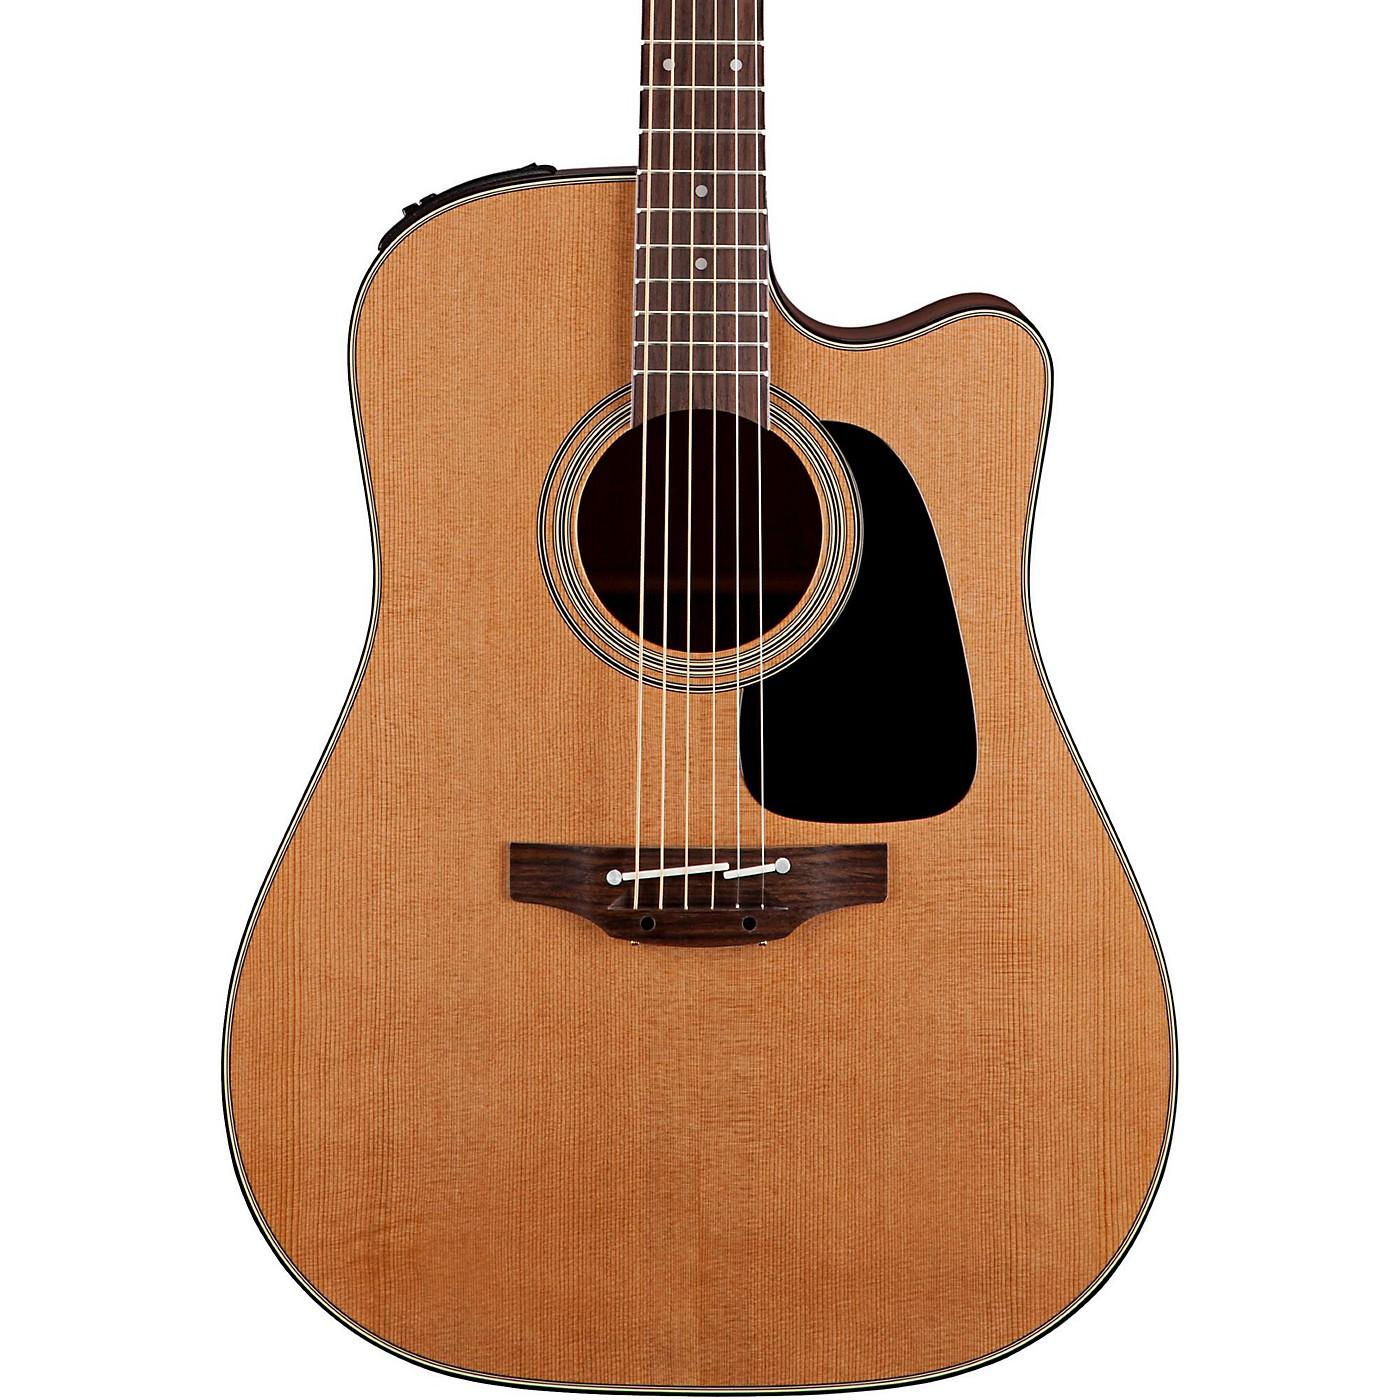 Takamine Pro Series 1 Dreadnought Cutaway Acoustic Electric Guitar thumbnail